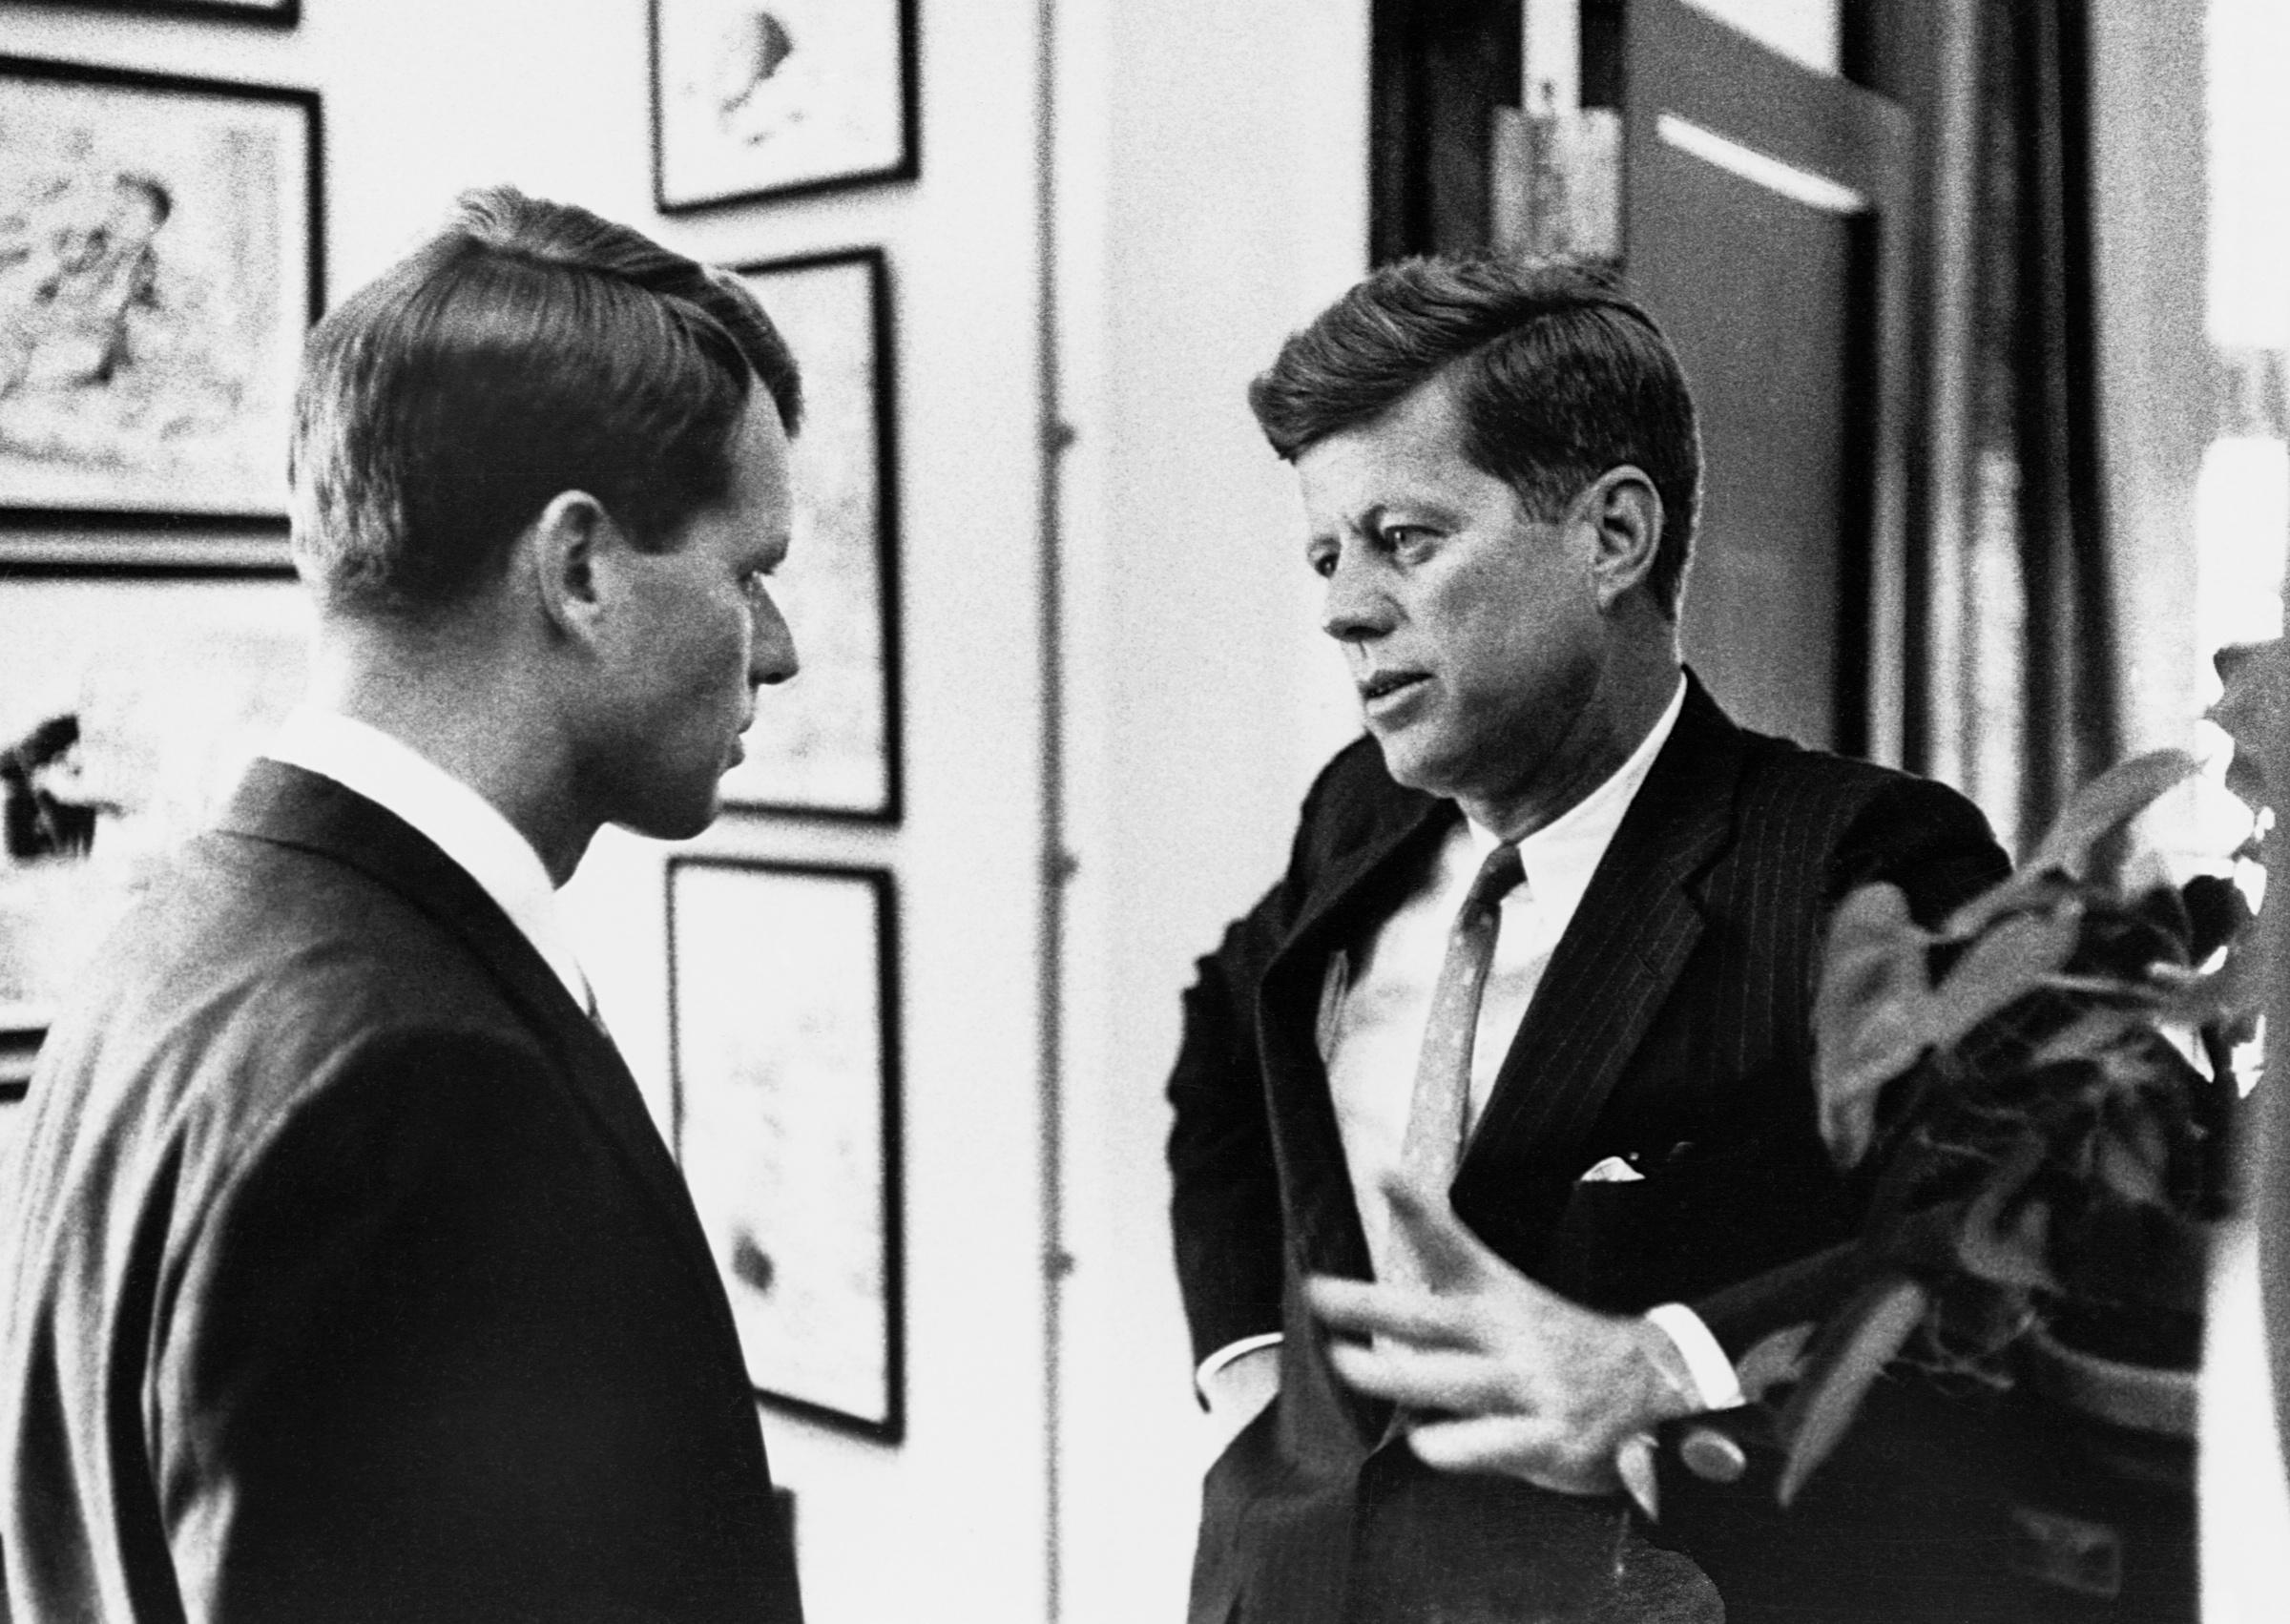 Джон Кеннеди и его брат Роберт. Фото © Getty Images / CORBIS